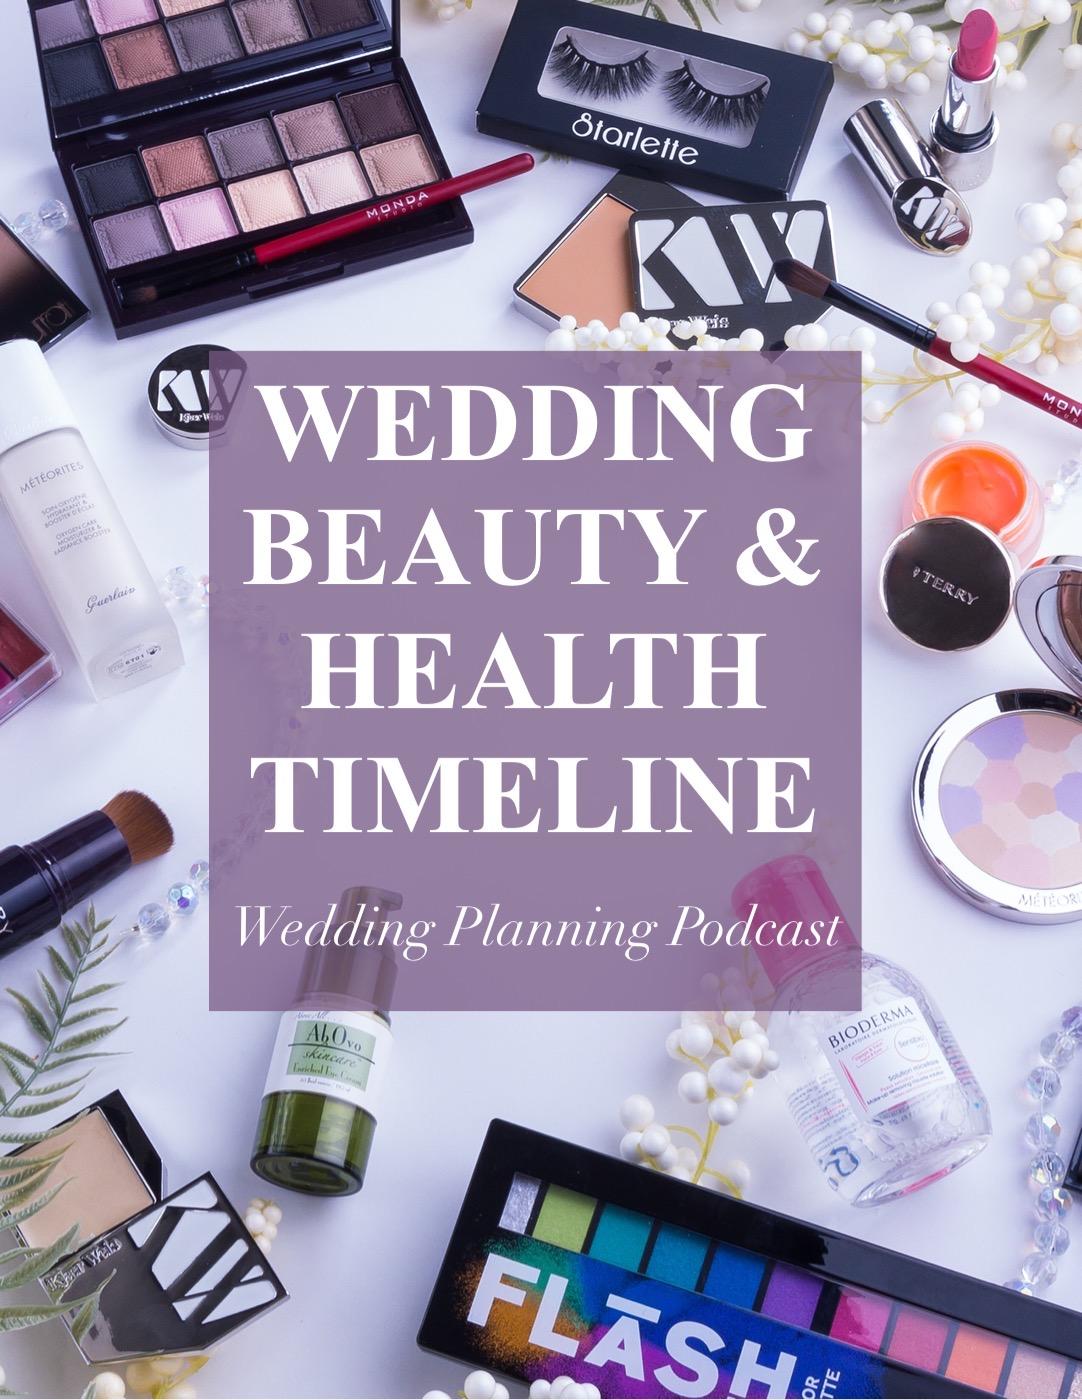 wedding beauty & health timeline